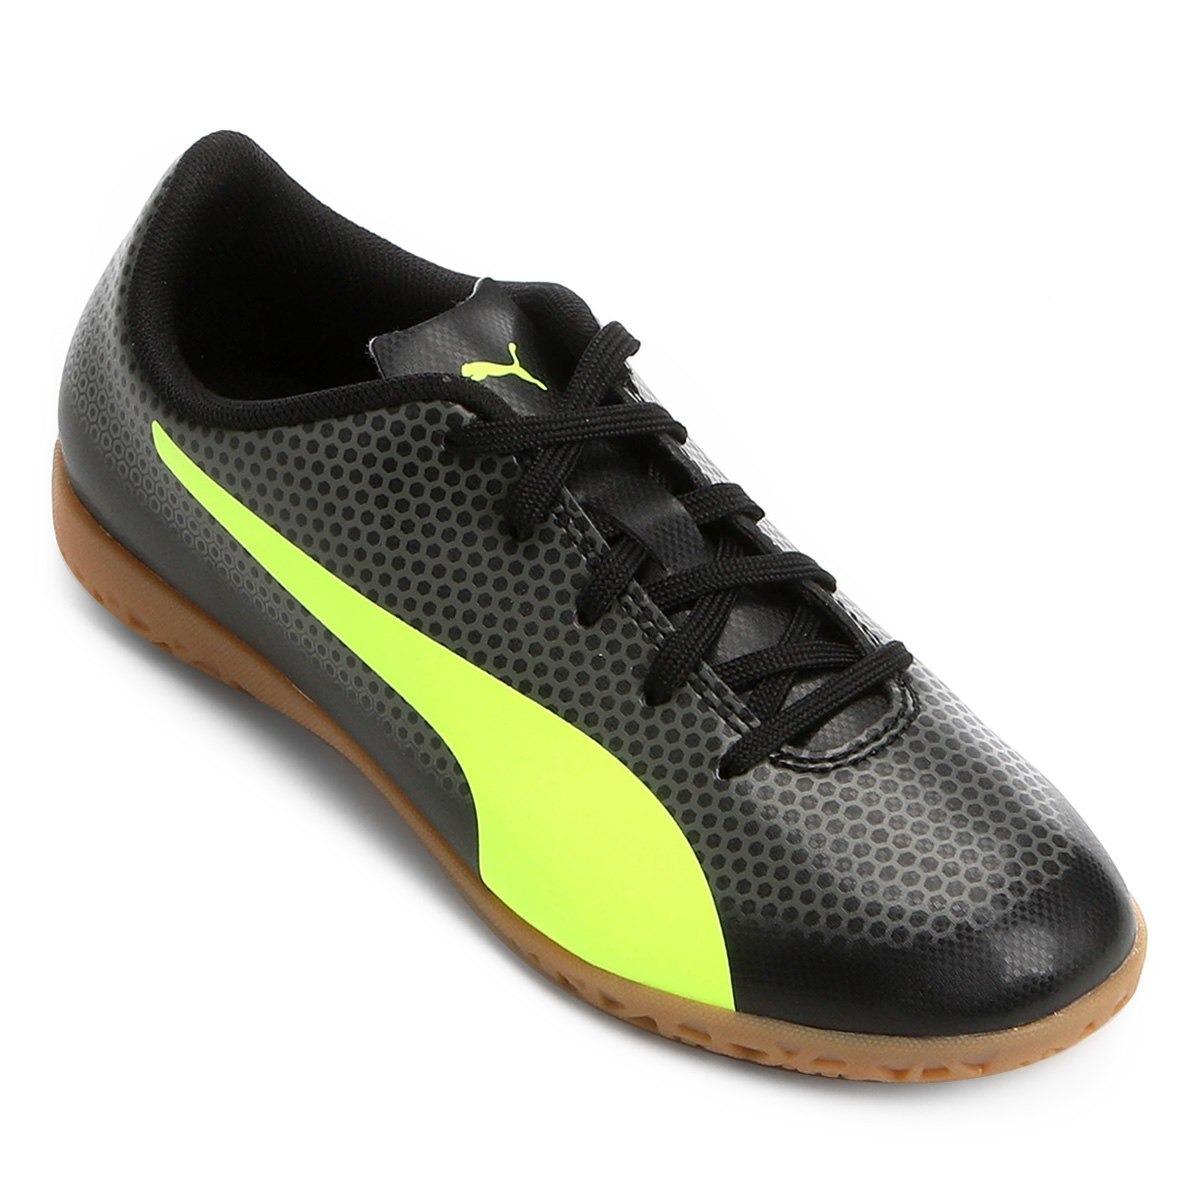 08272ad2cb Chuteira Puma Futsal Spirit Infantil - Original - R  159